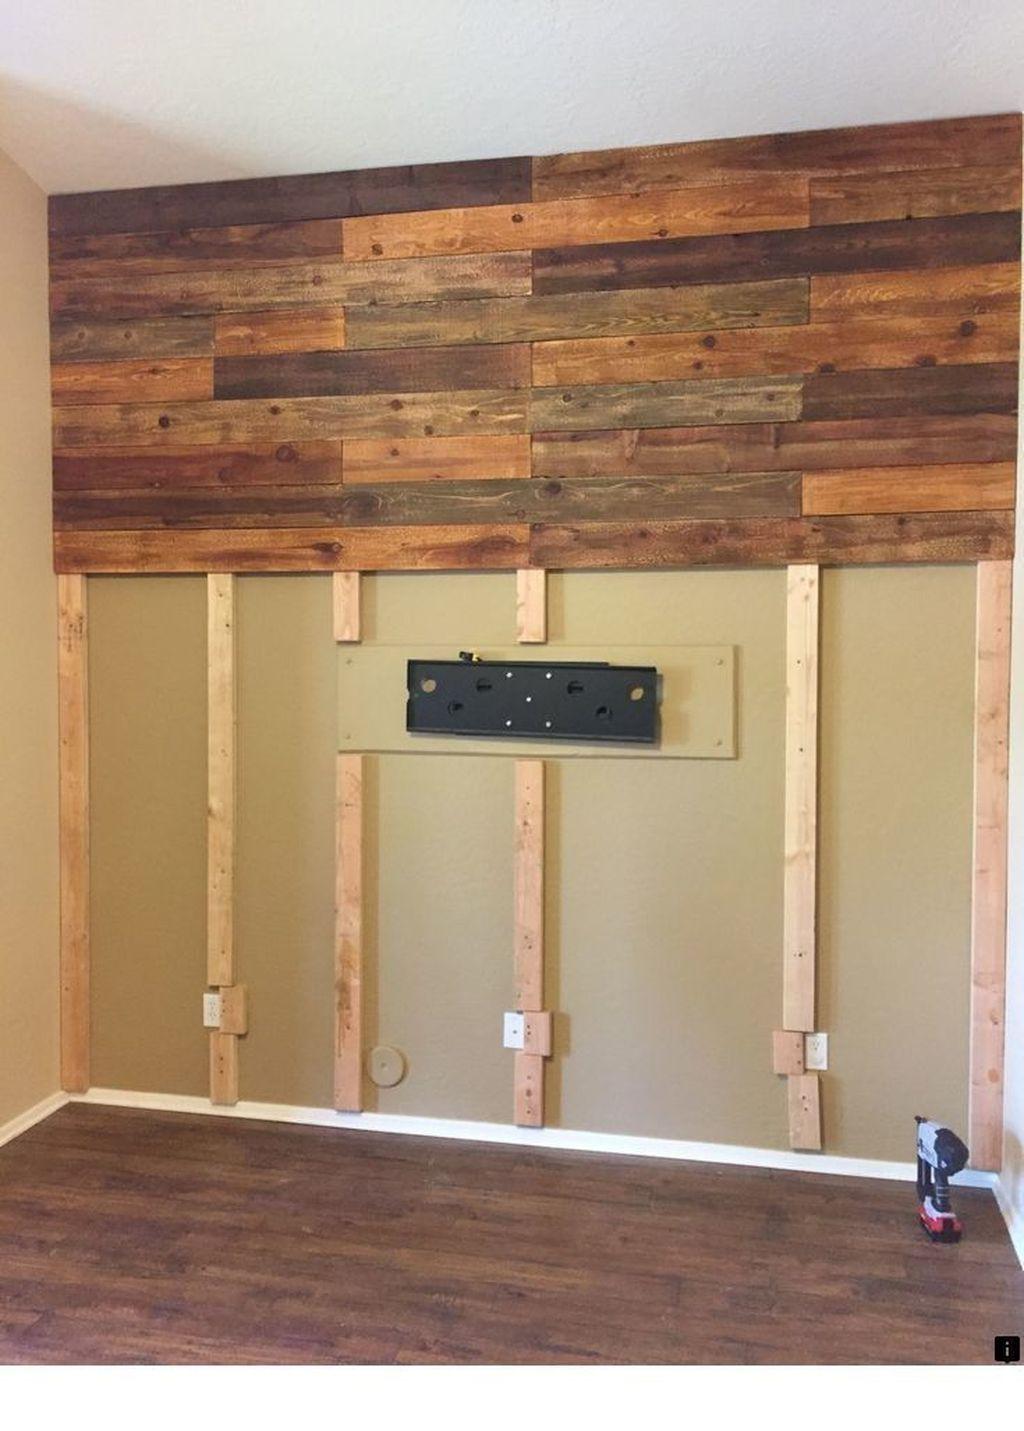 48 Wonderful Diy Pallet Wall Design Ideas To Beautify Interior Rustic Wood Wall Decor Wood Walls Living Room Rustic Wood Walls